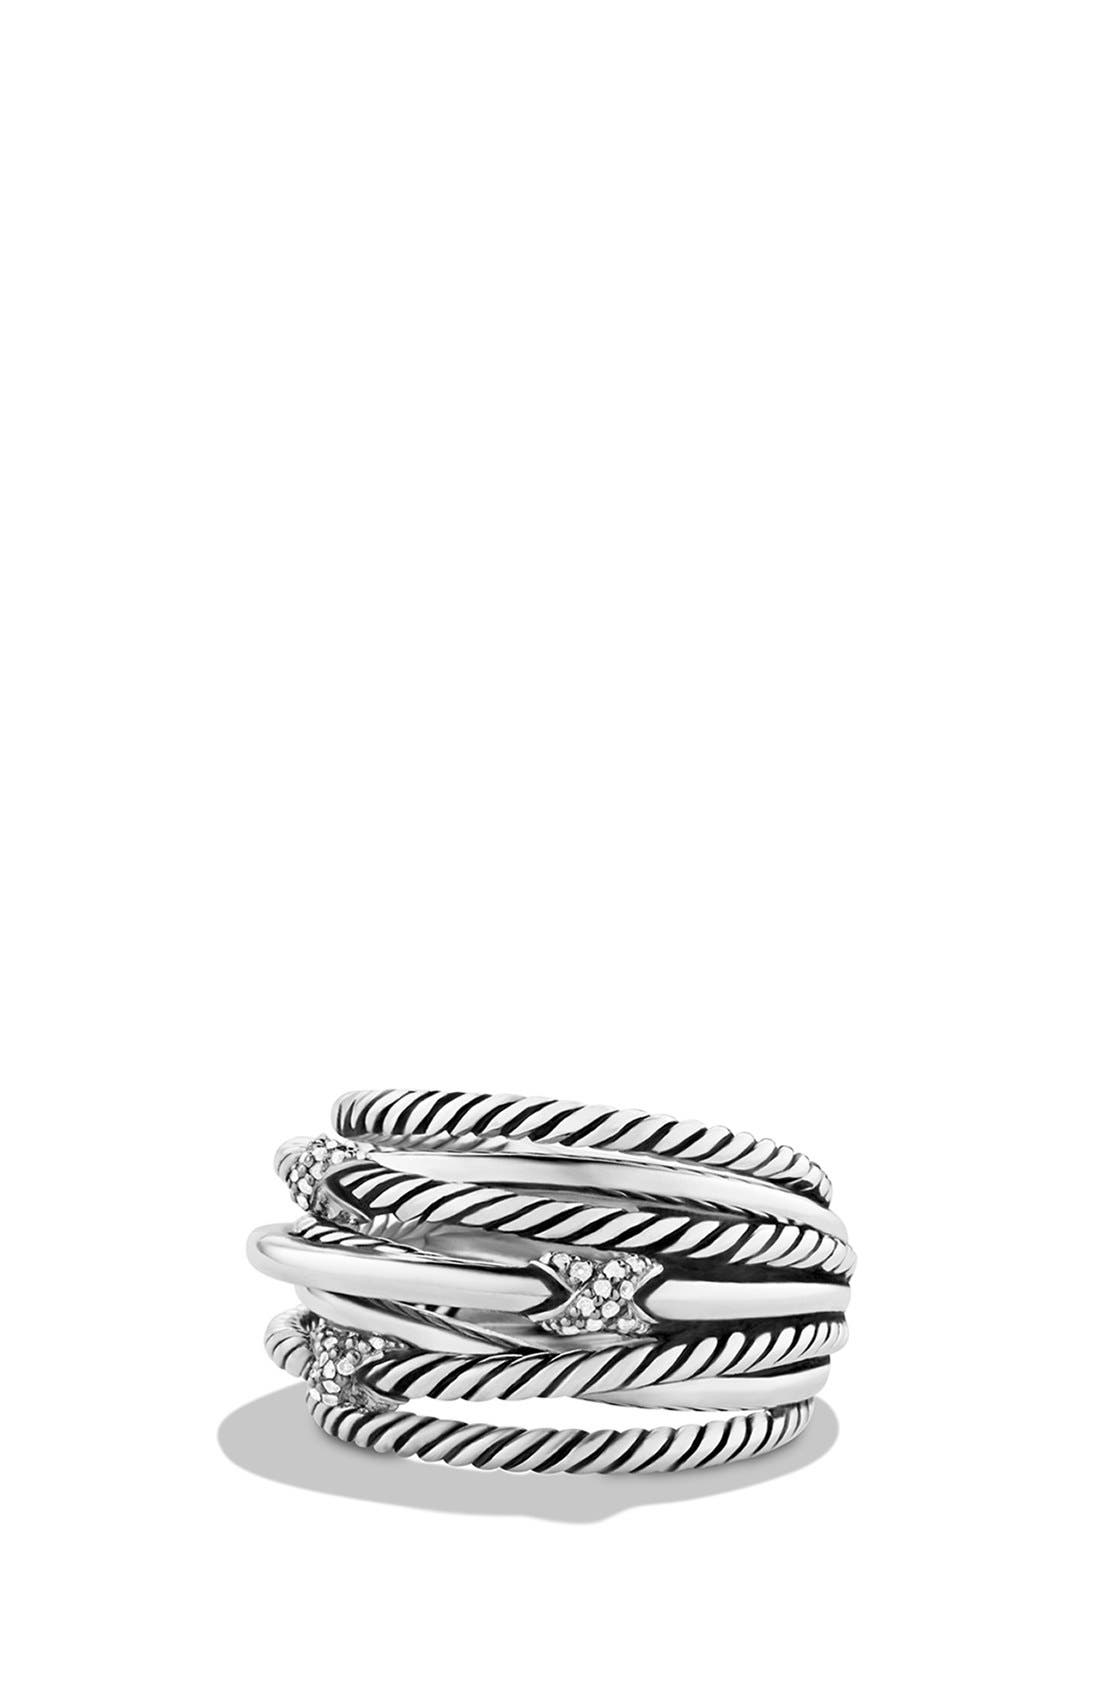 Alternate Image 1 Selected - David Yurman 'Three X Crossover' Ring with Diamonds